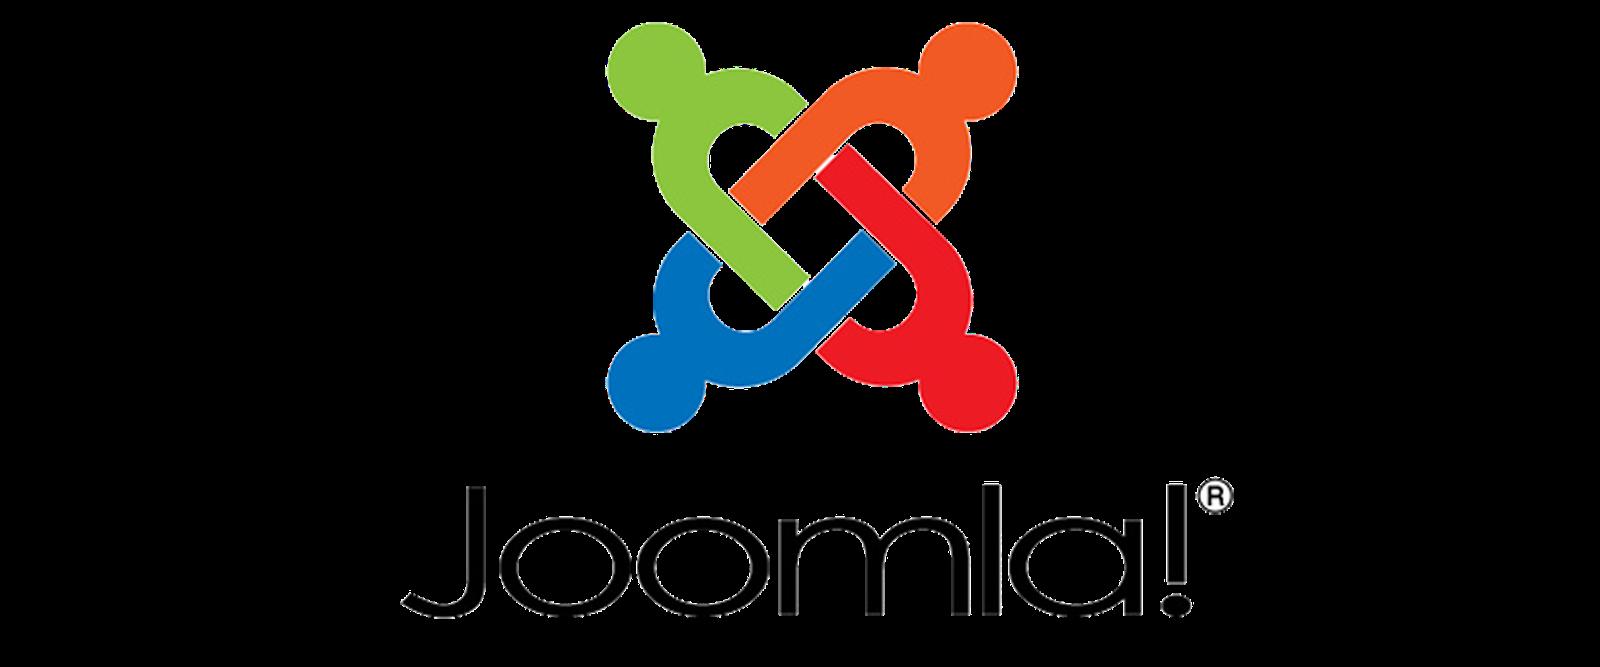 Joomla Content Management logo